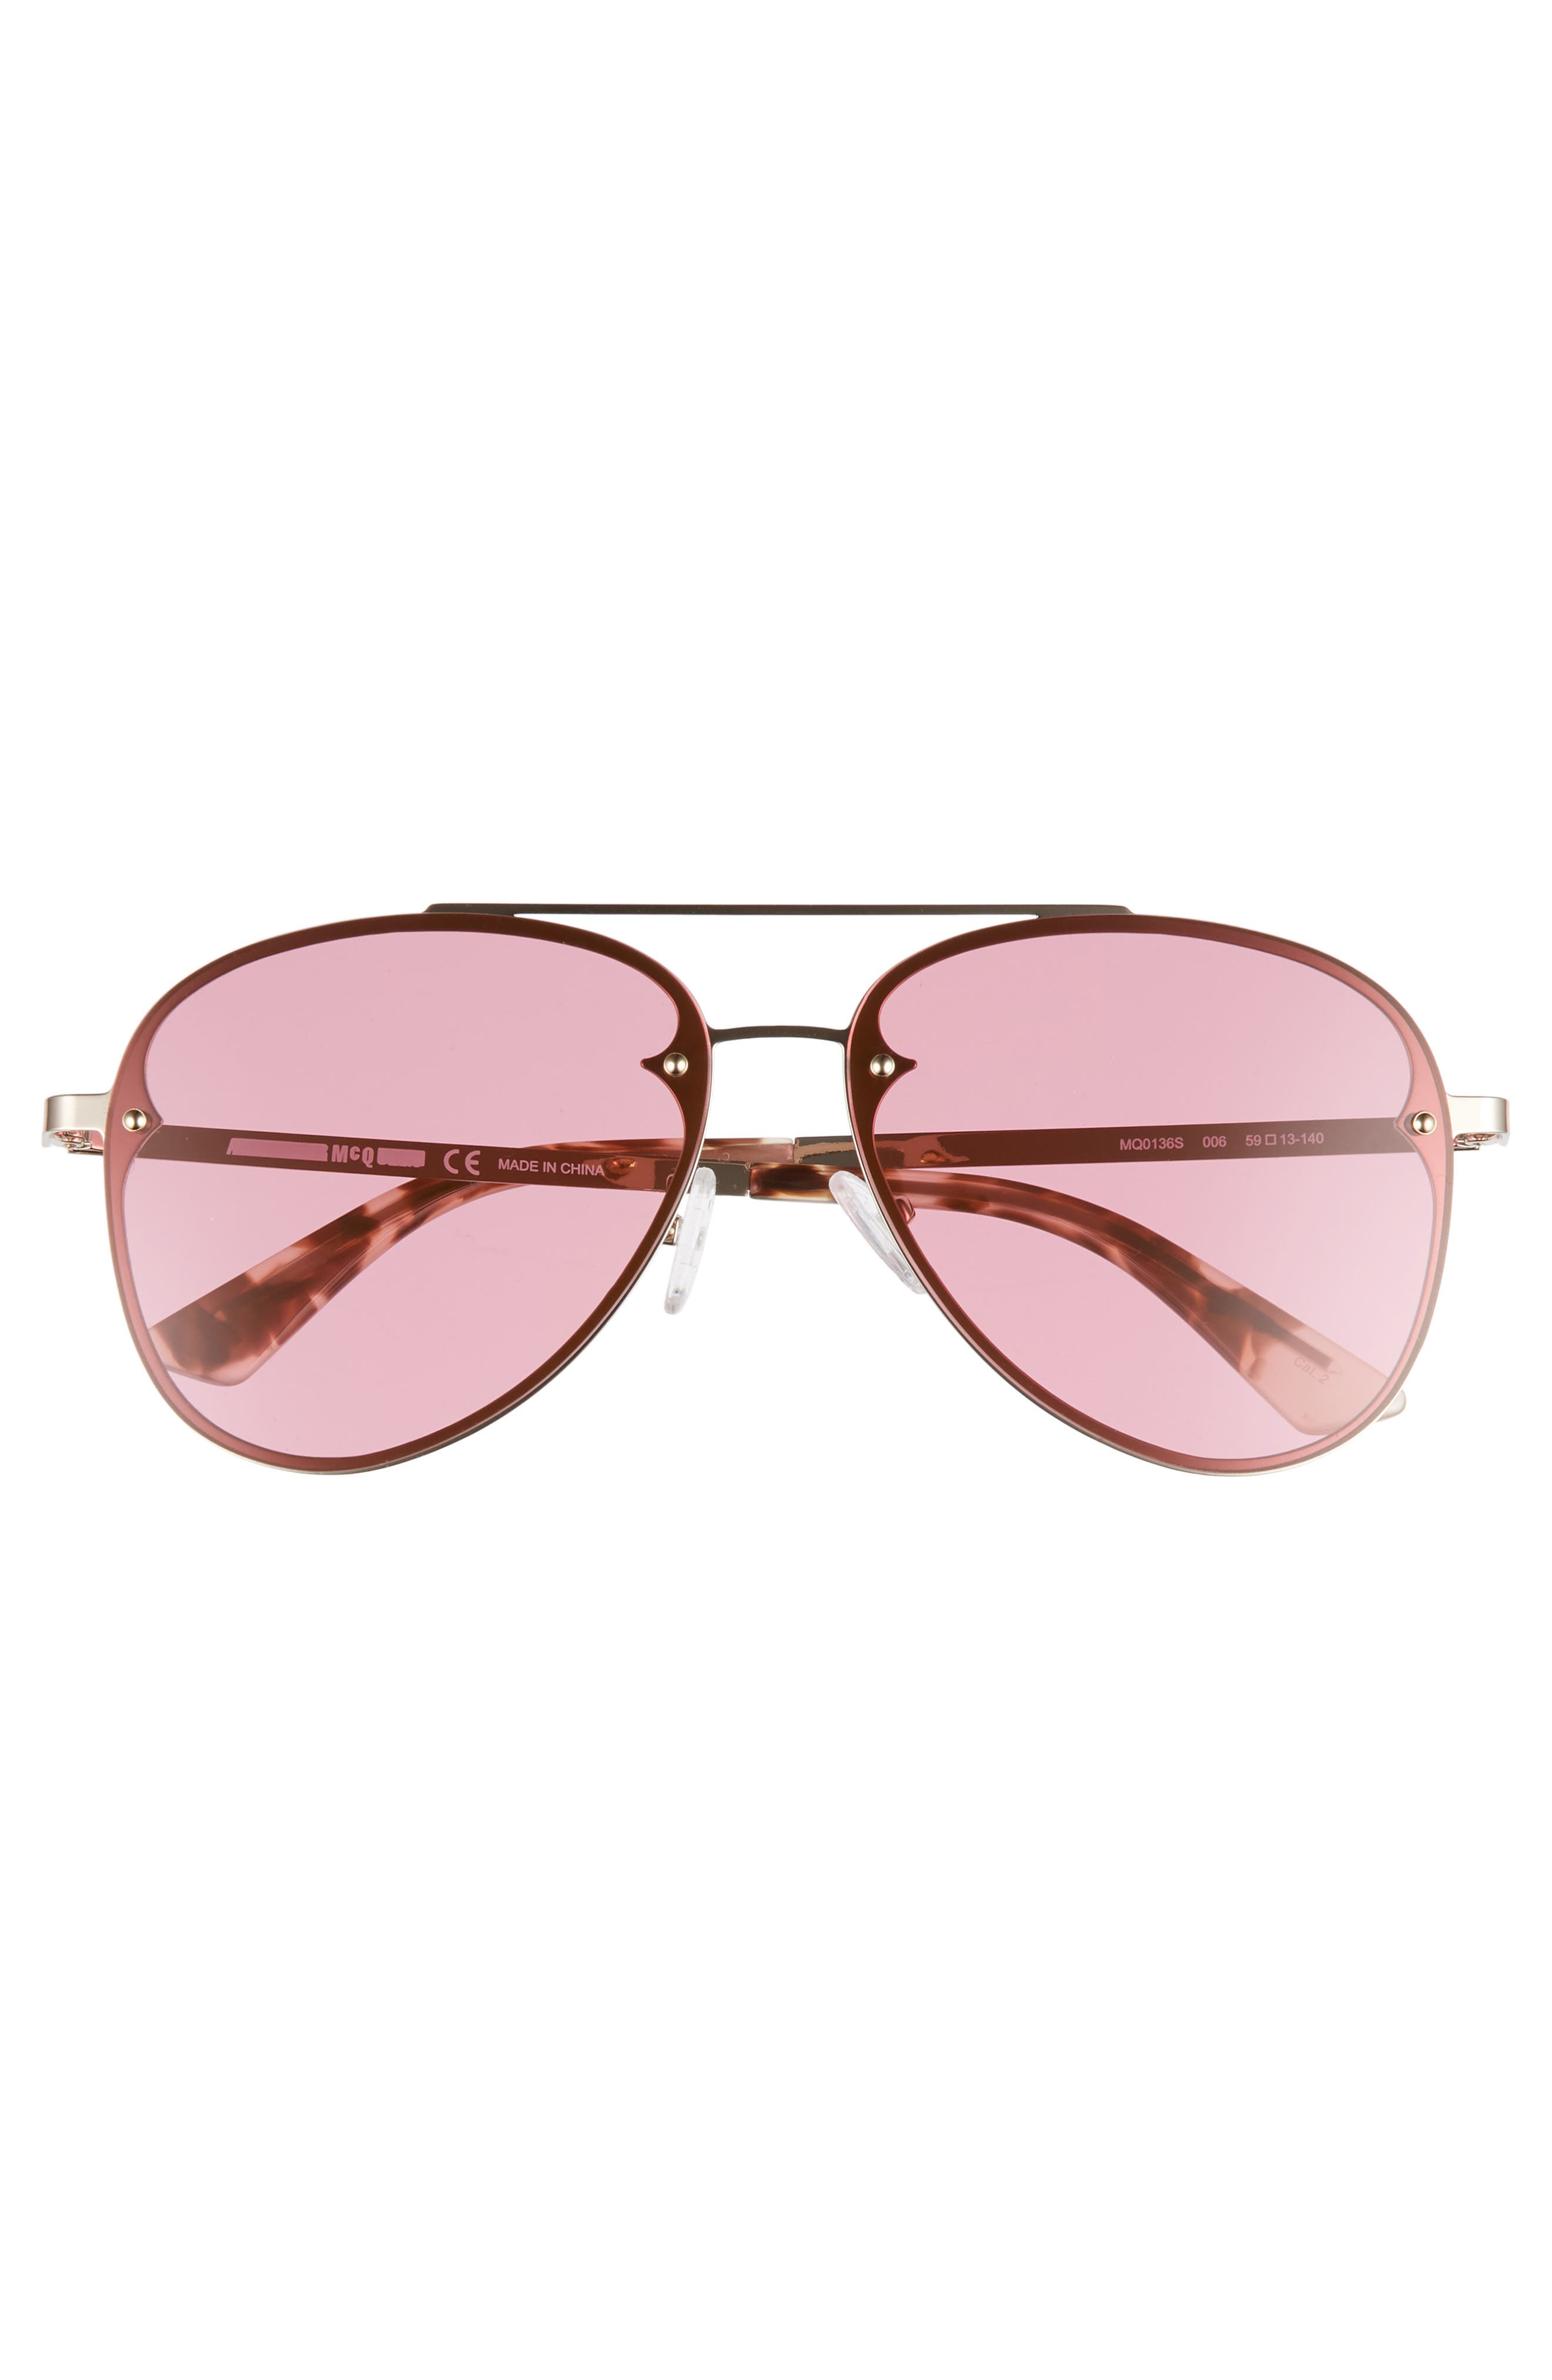 59mm Aviator Sunglasses,                             Alternate thumbnail 3, color,                             Gold